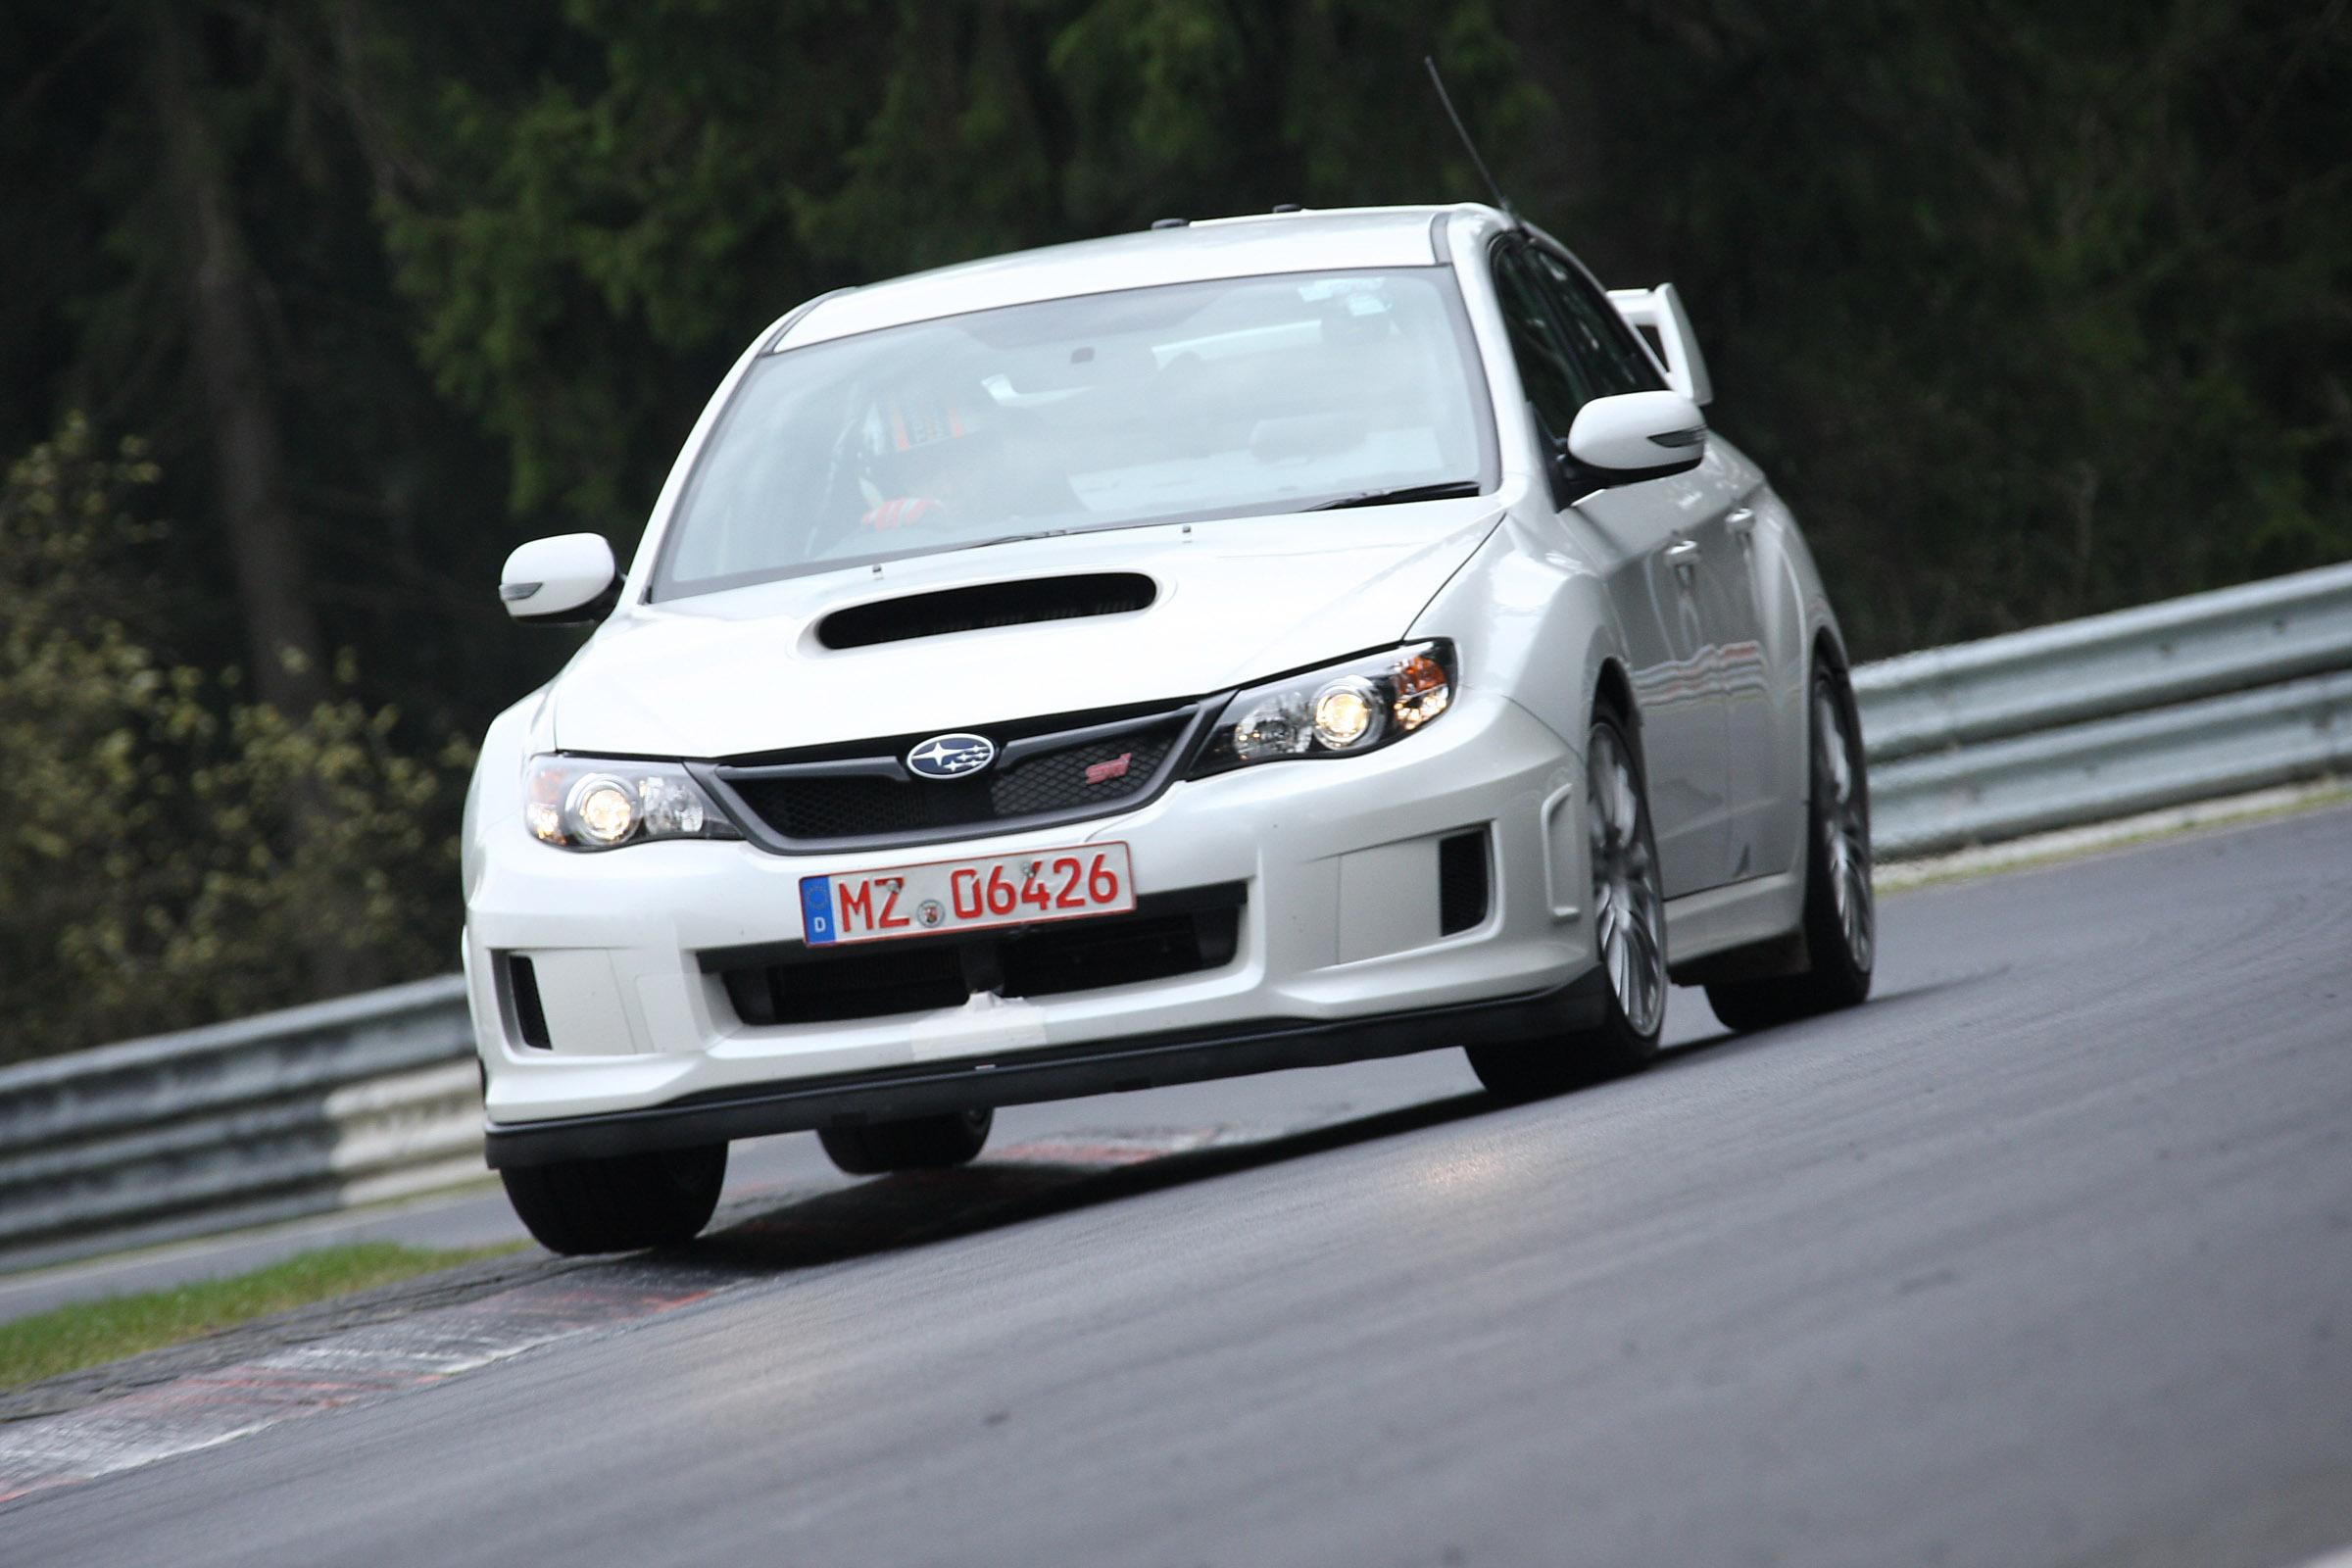 2011 Subaru WRX STi седан испытания на Нюрбургринге - фотография №11